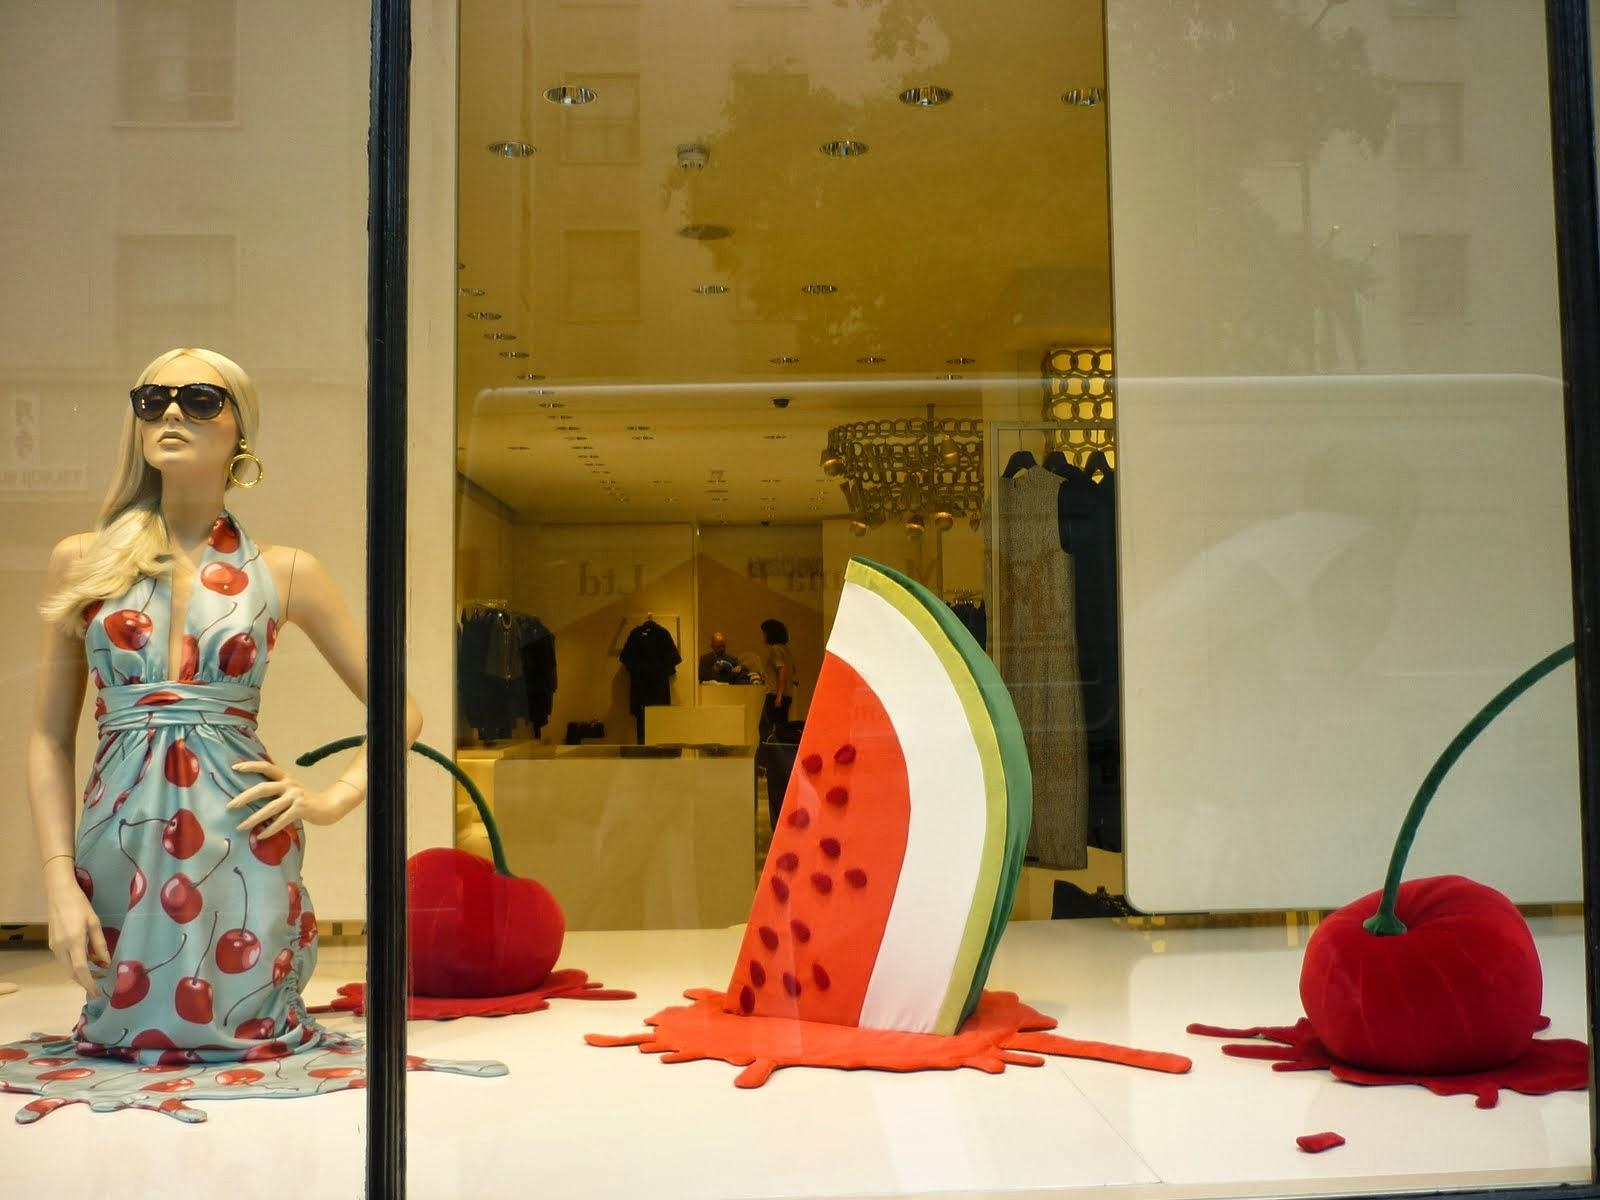 Fashion merchandising research topics 27